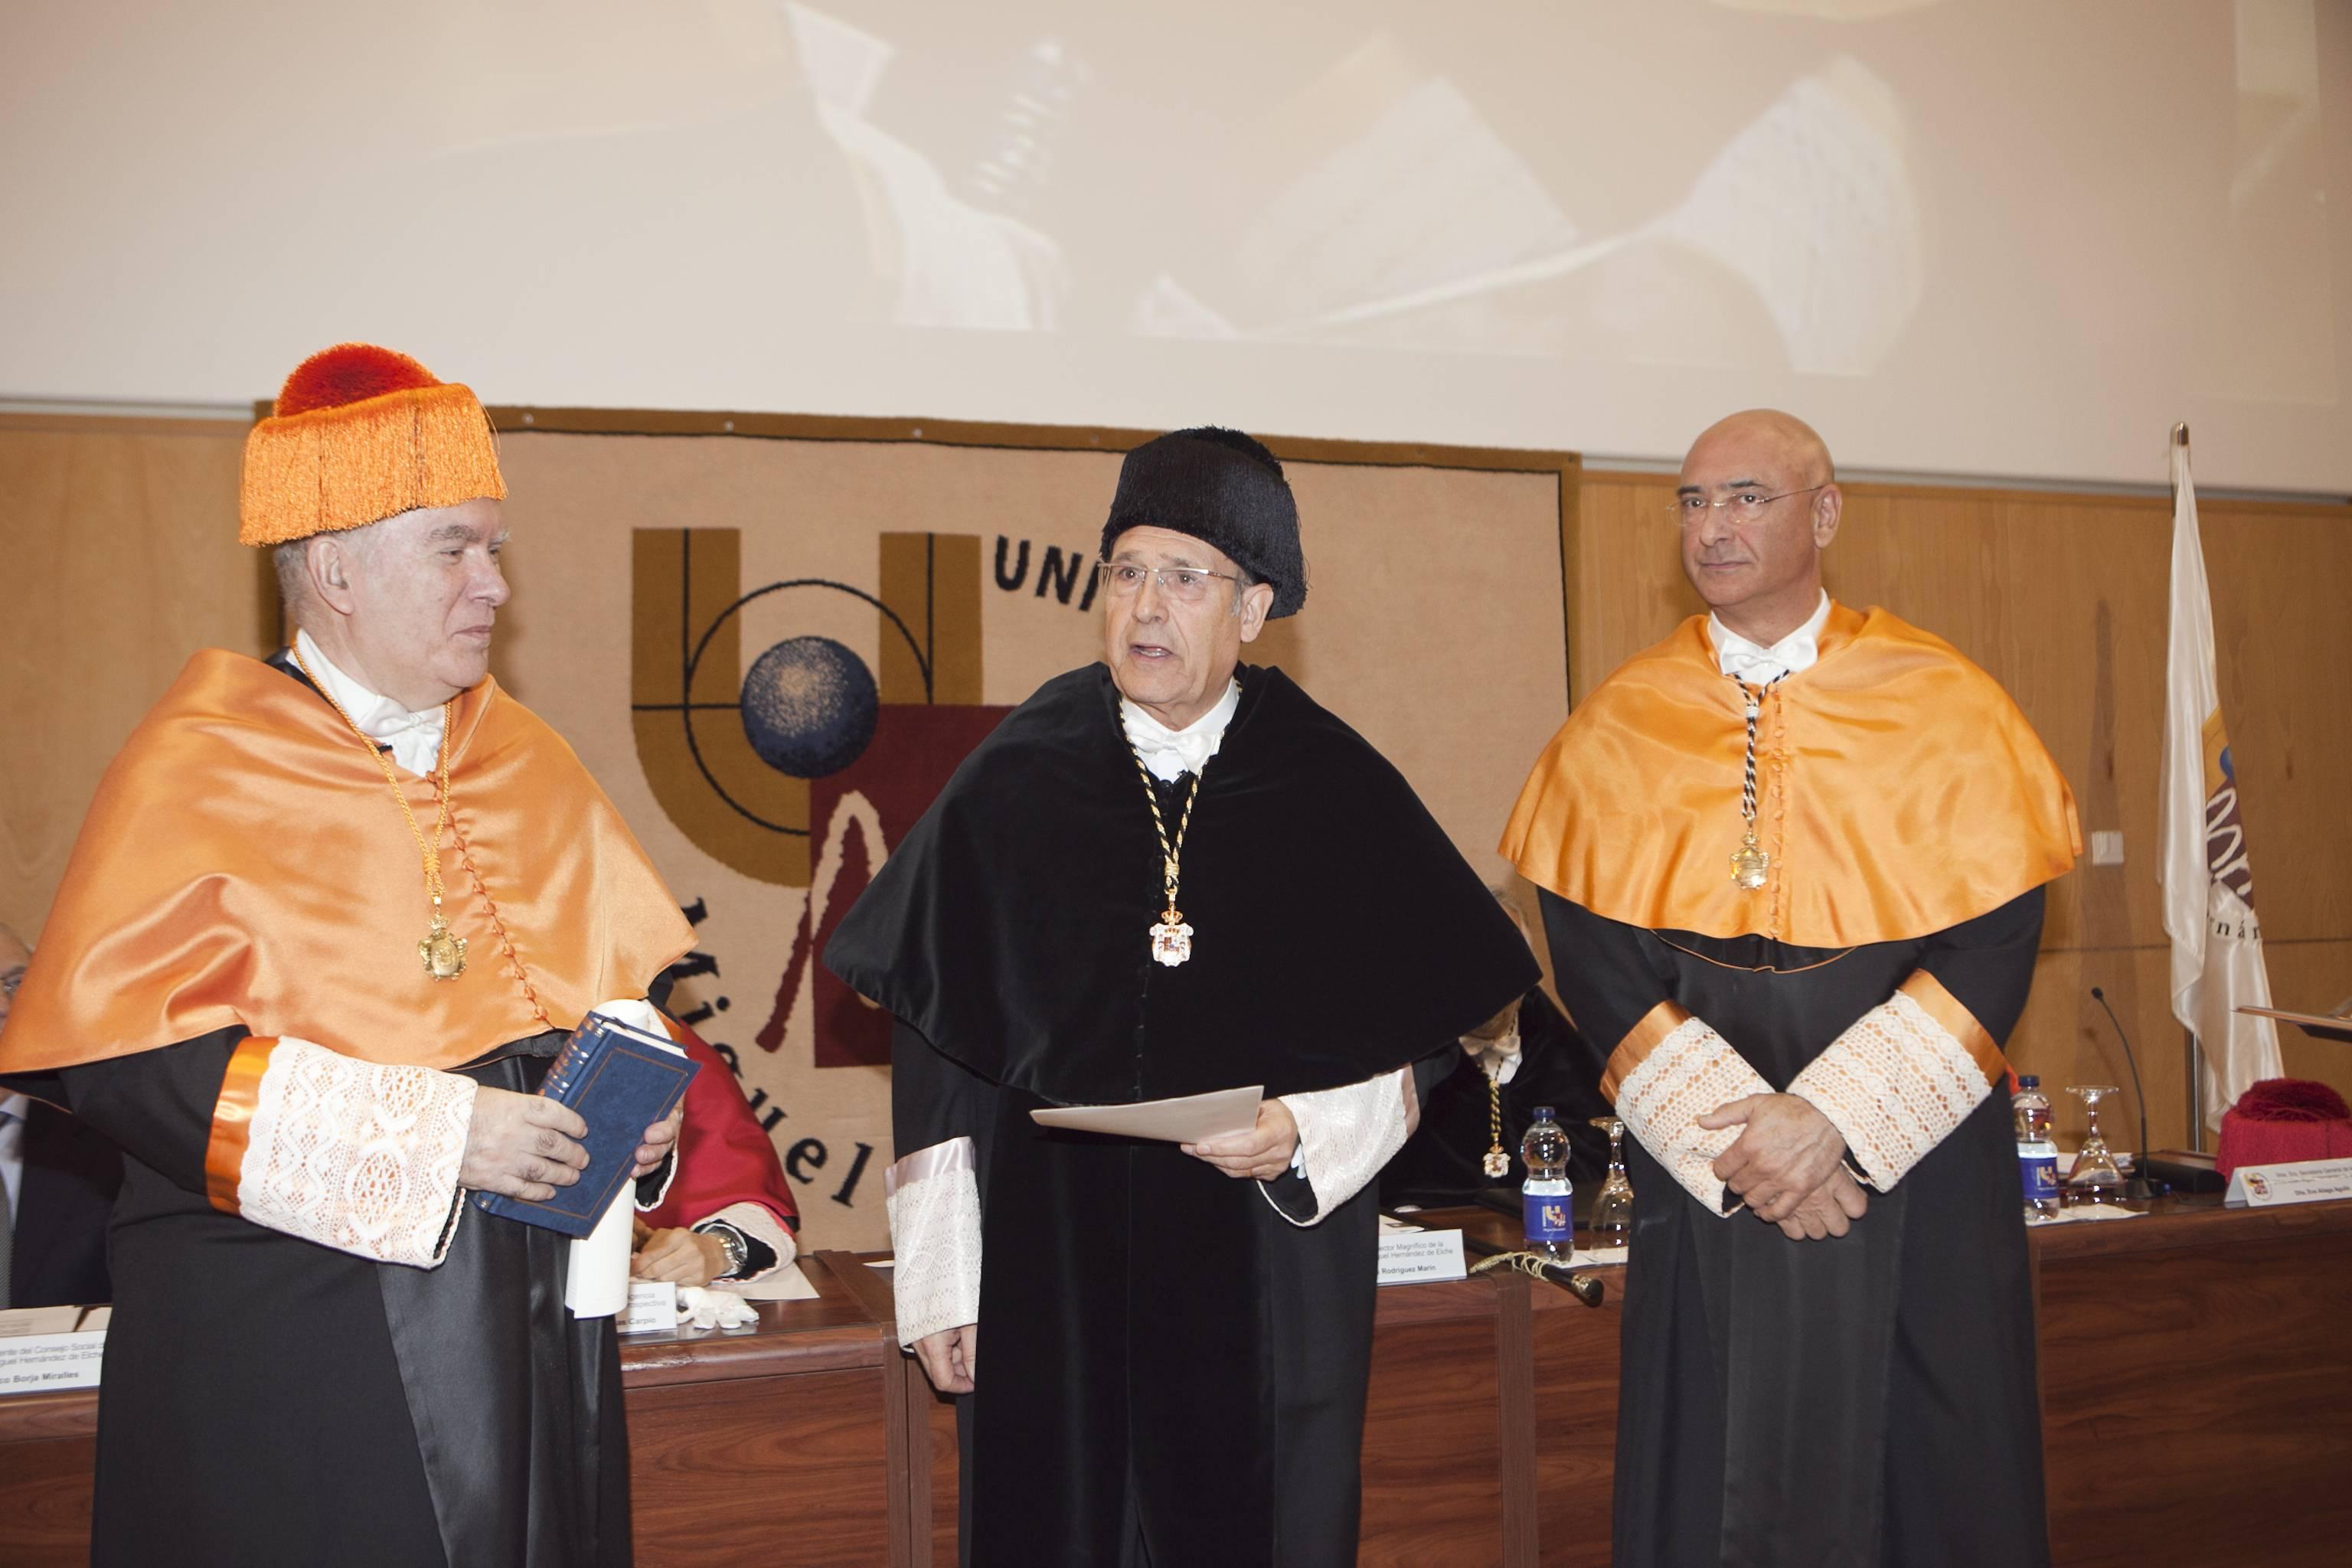 doctor-honoris-causa-luis-gamir_mg_0759.jpg